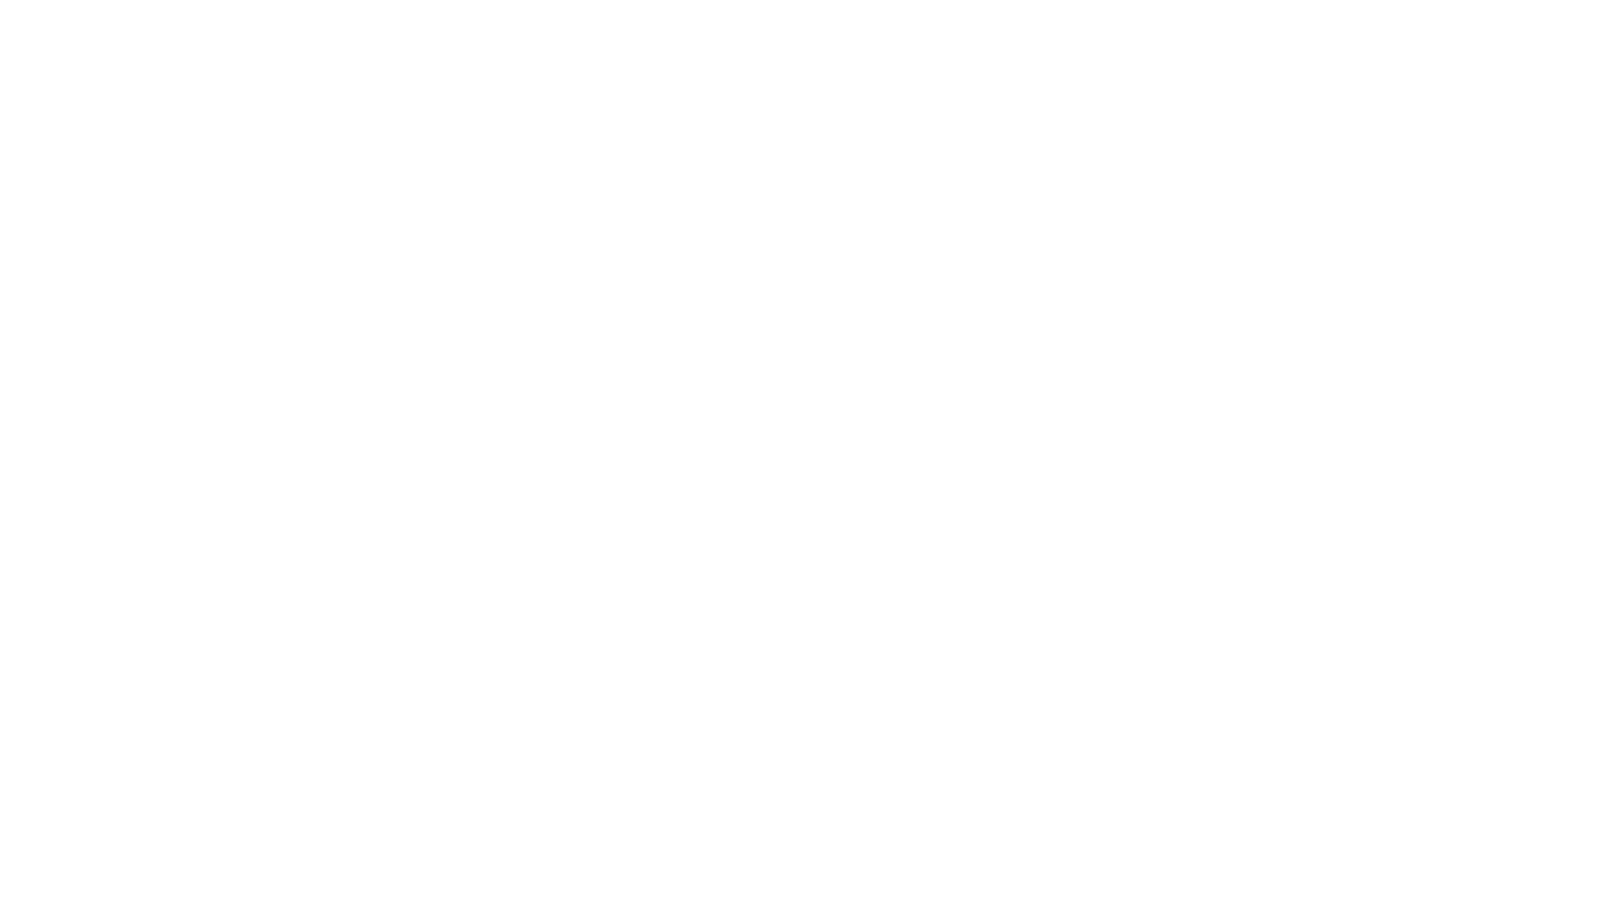 Marcuslogo